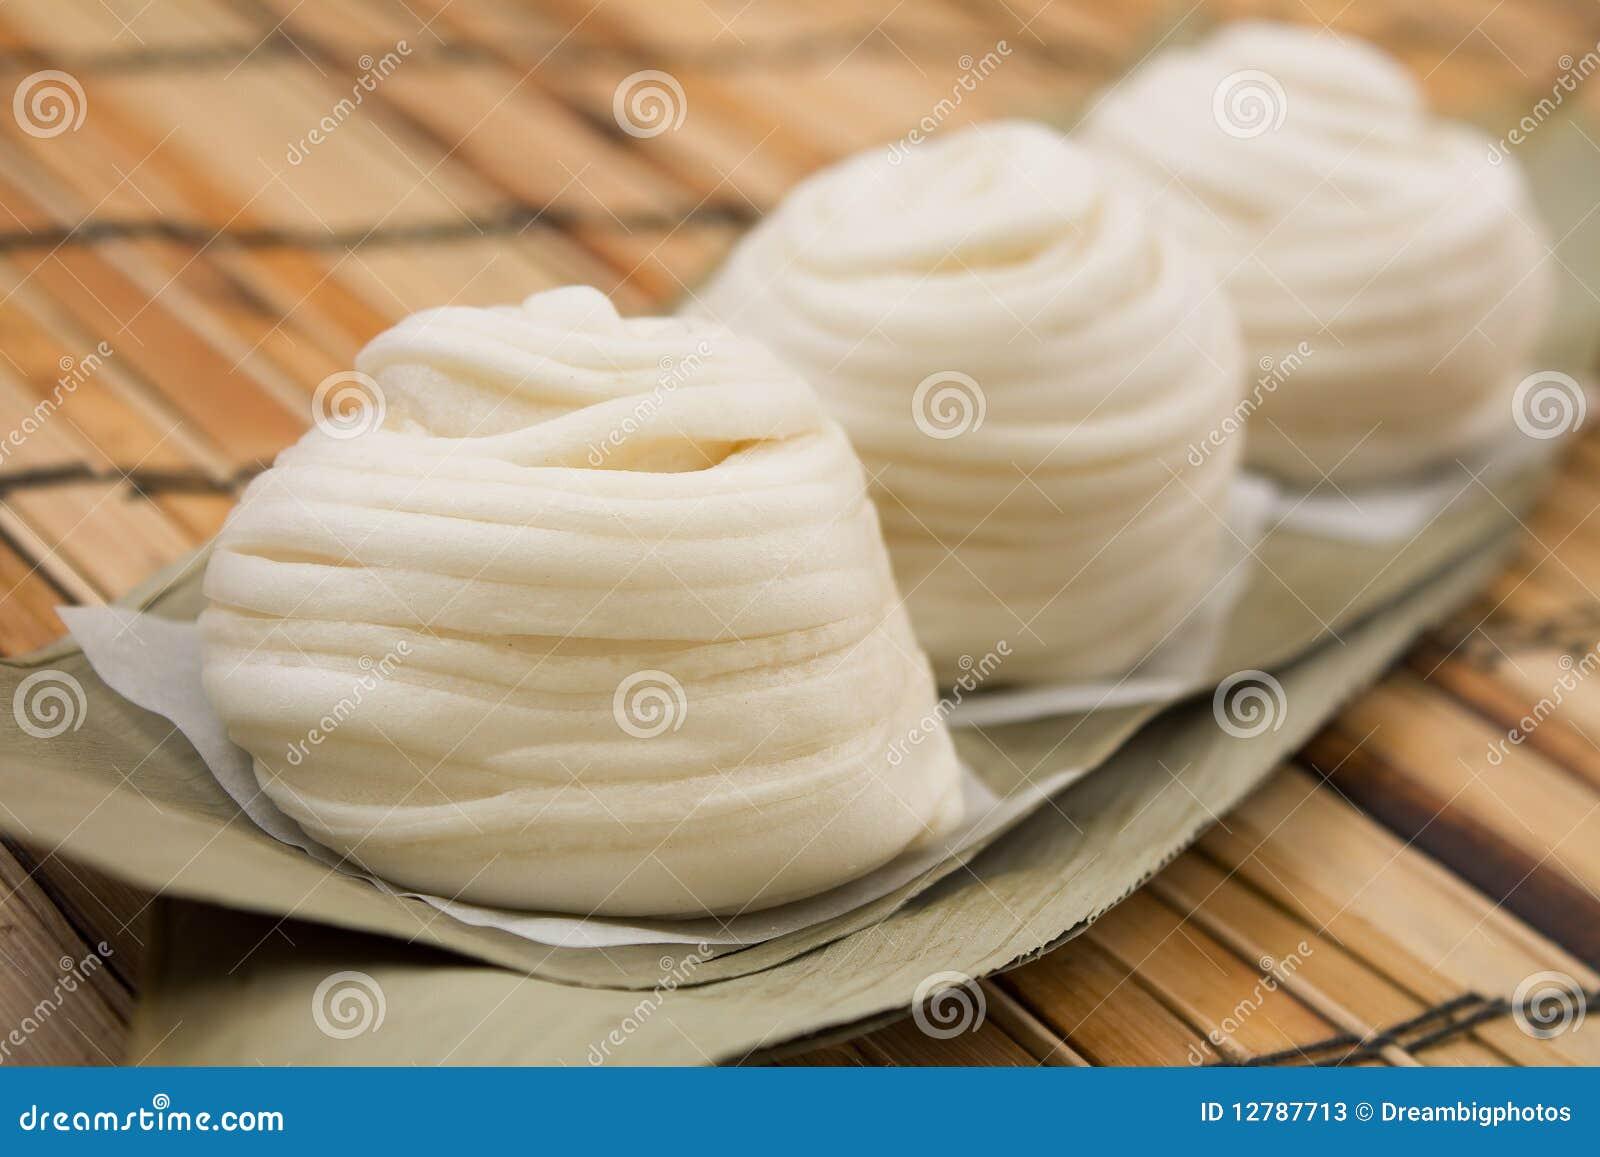 WWW_78YIN_COM_小圆面包叫中国胡安卷si银被蒸的线程数yin.